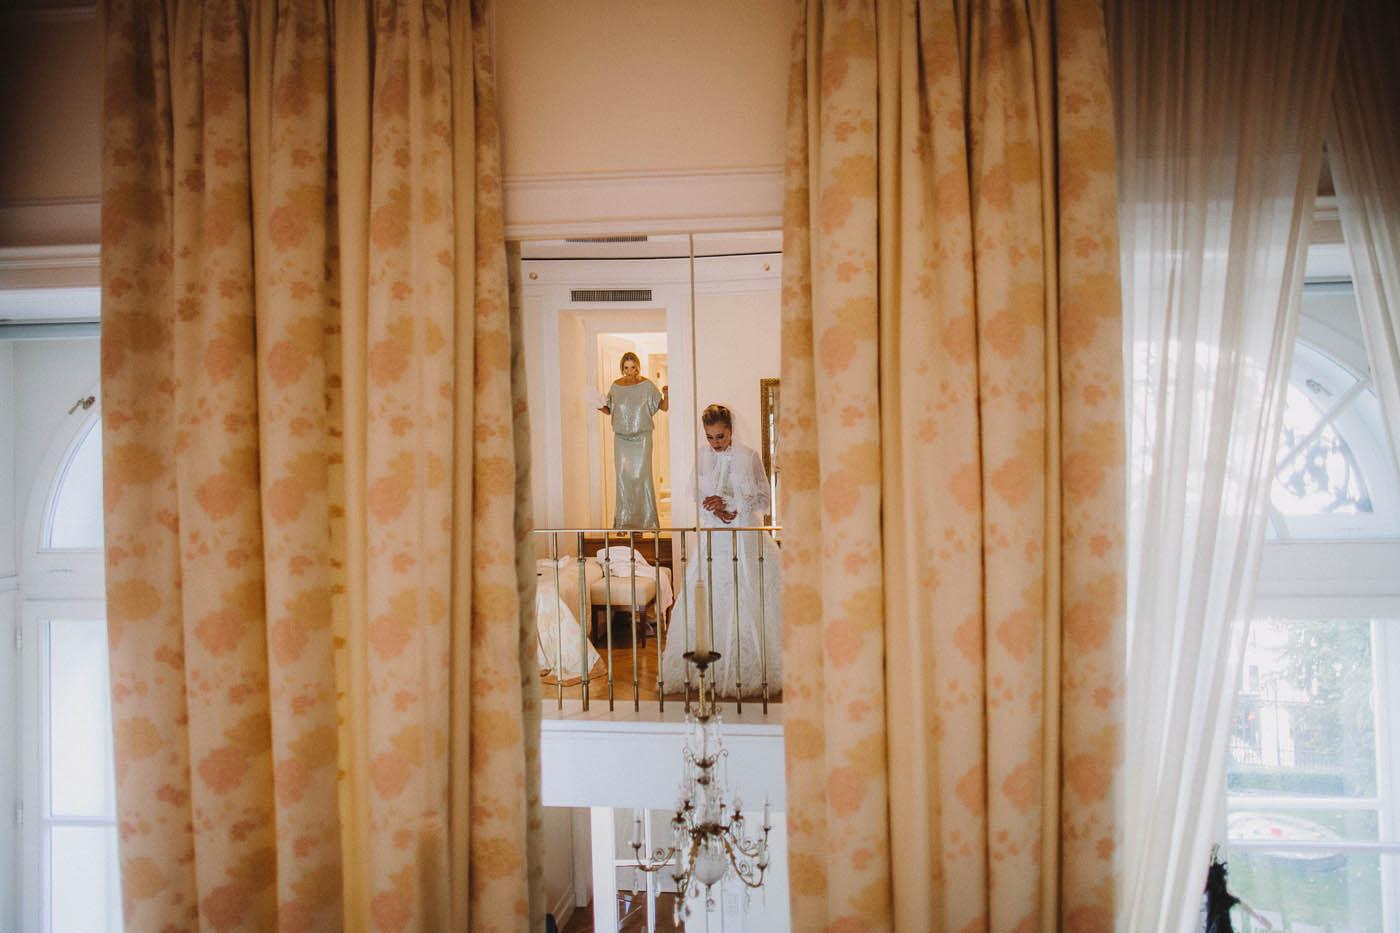 coburg-vienna-wedding-photographer-92